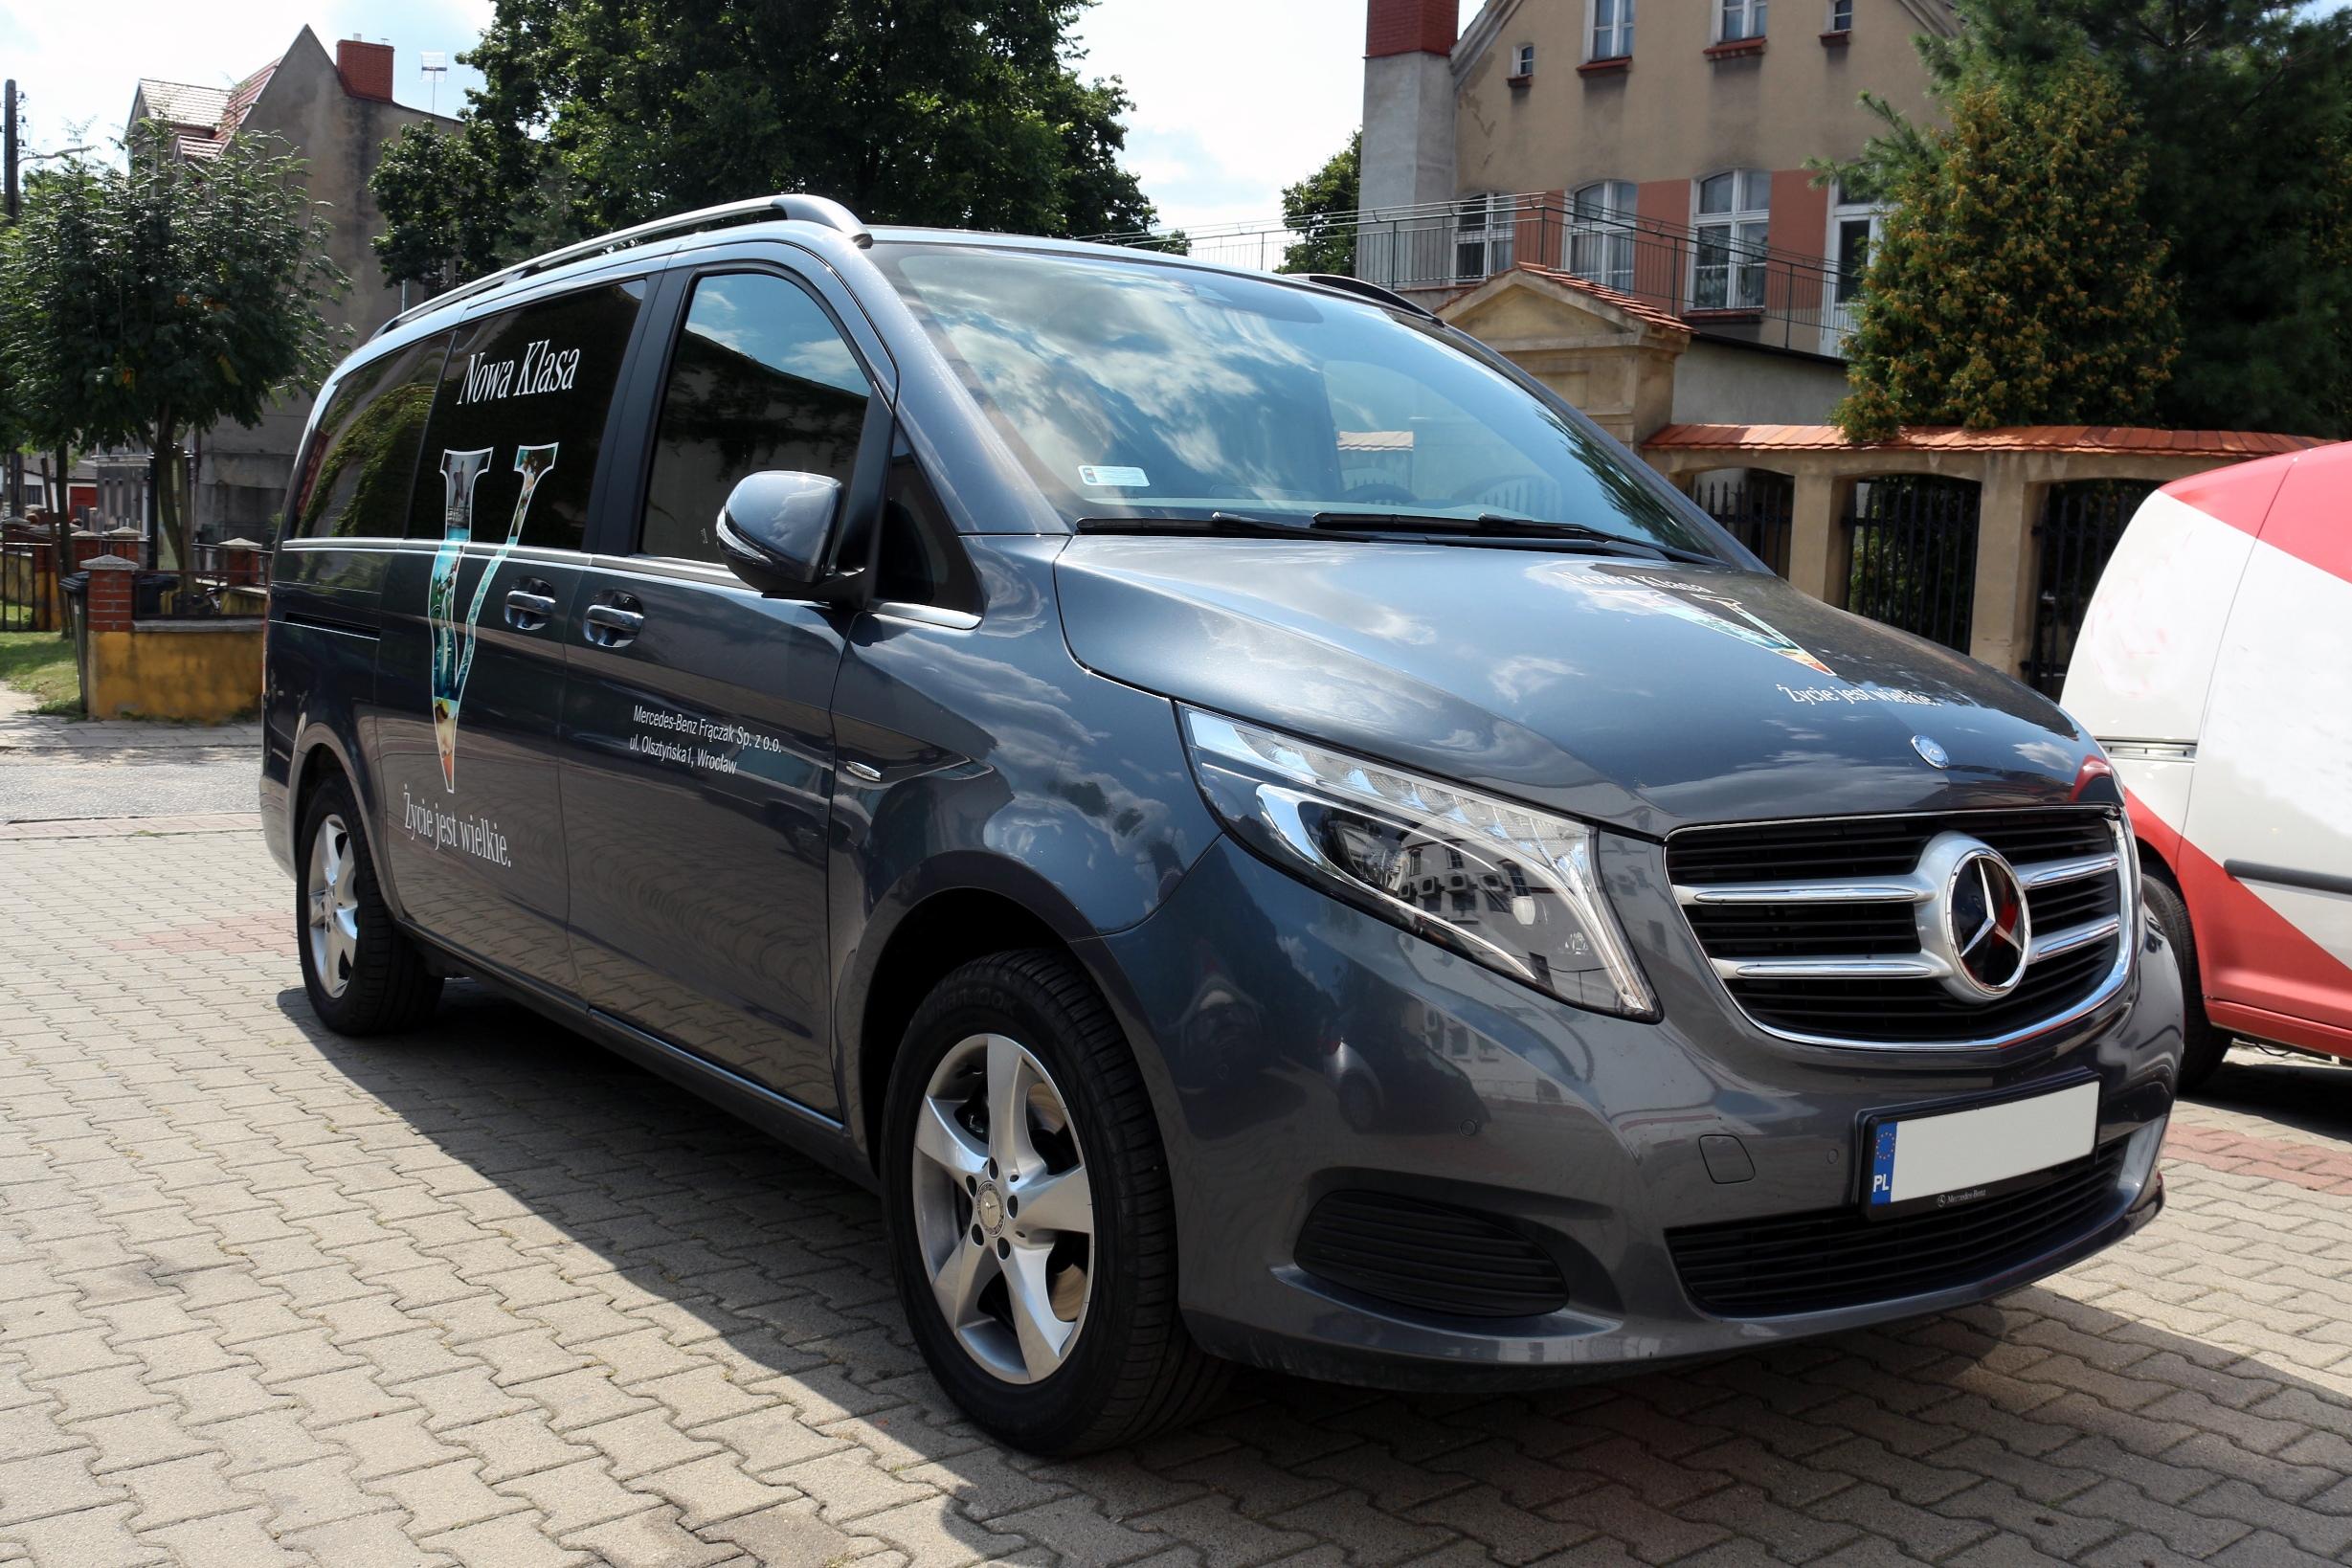 File:Mercedes benz w447 v250 (2014) grey.jpg - Wikimedia ...